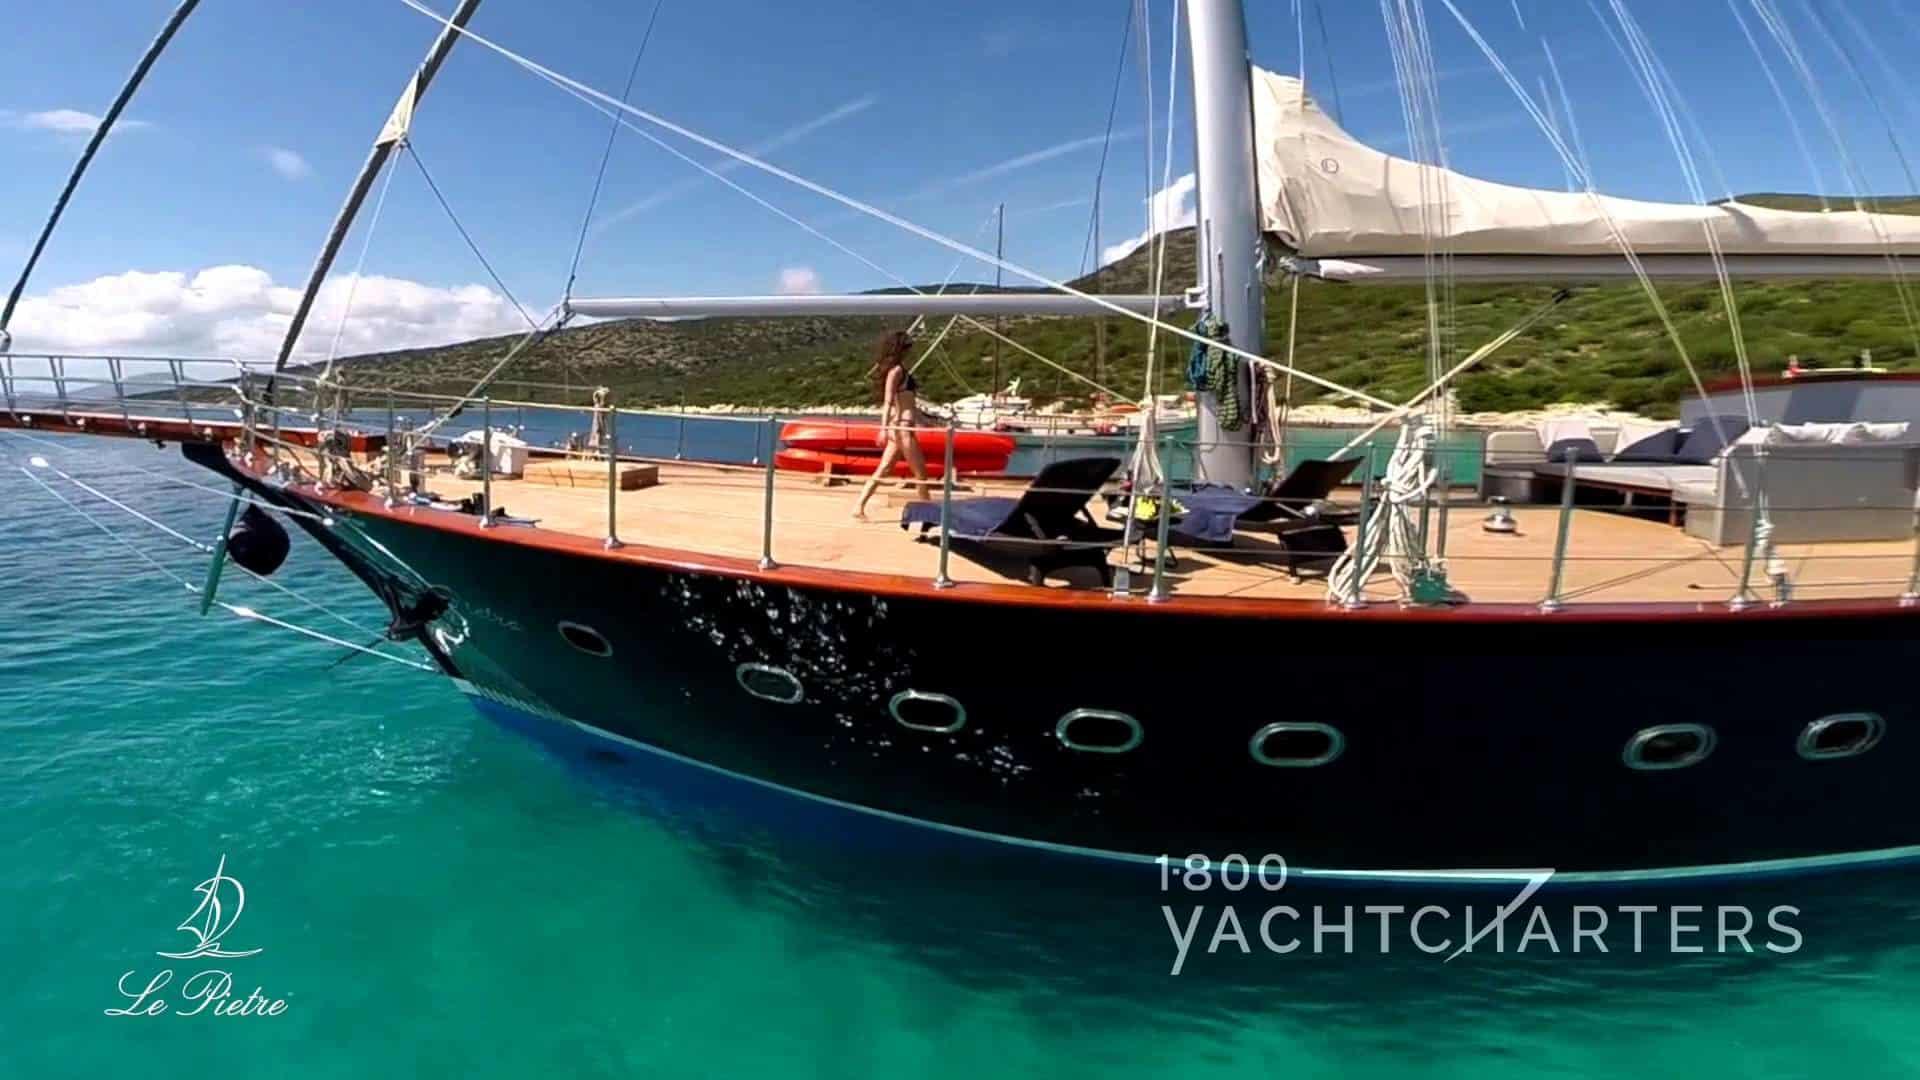 Sailboat Le Pietre yacht charter Turkey Bodrum